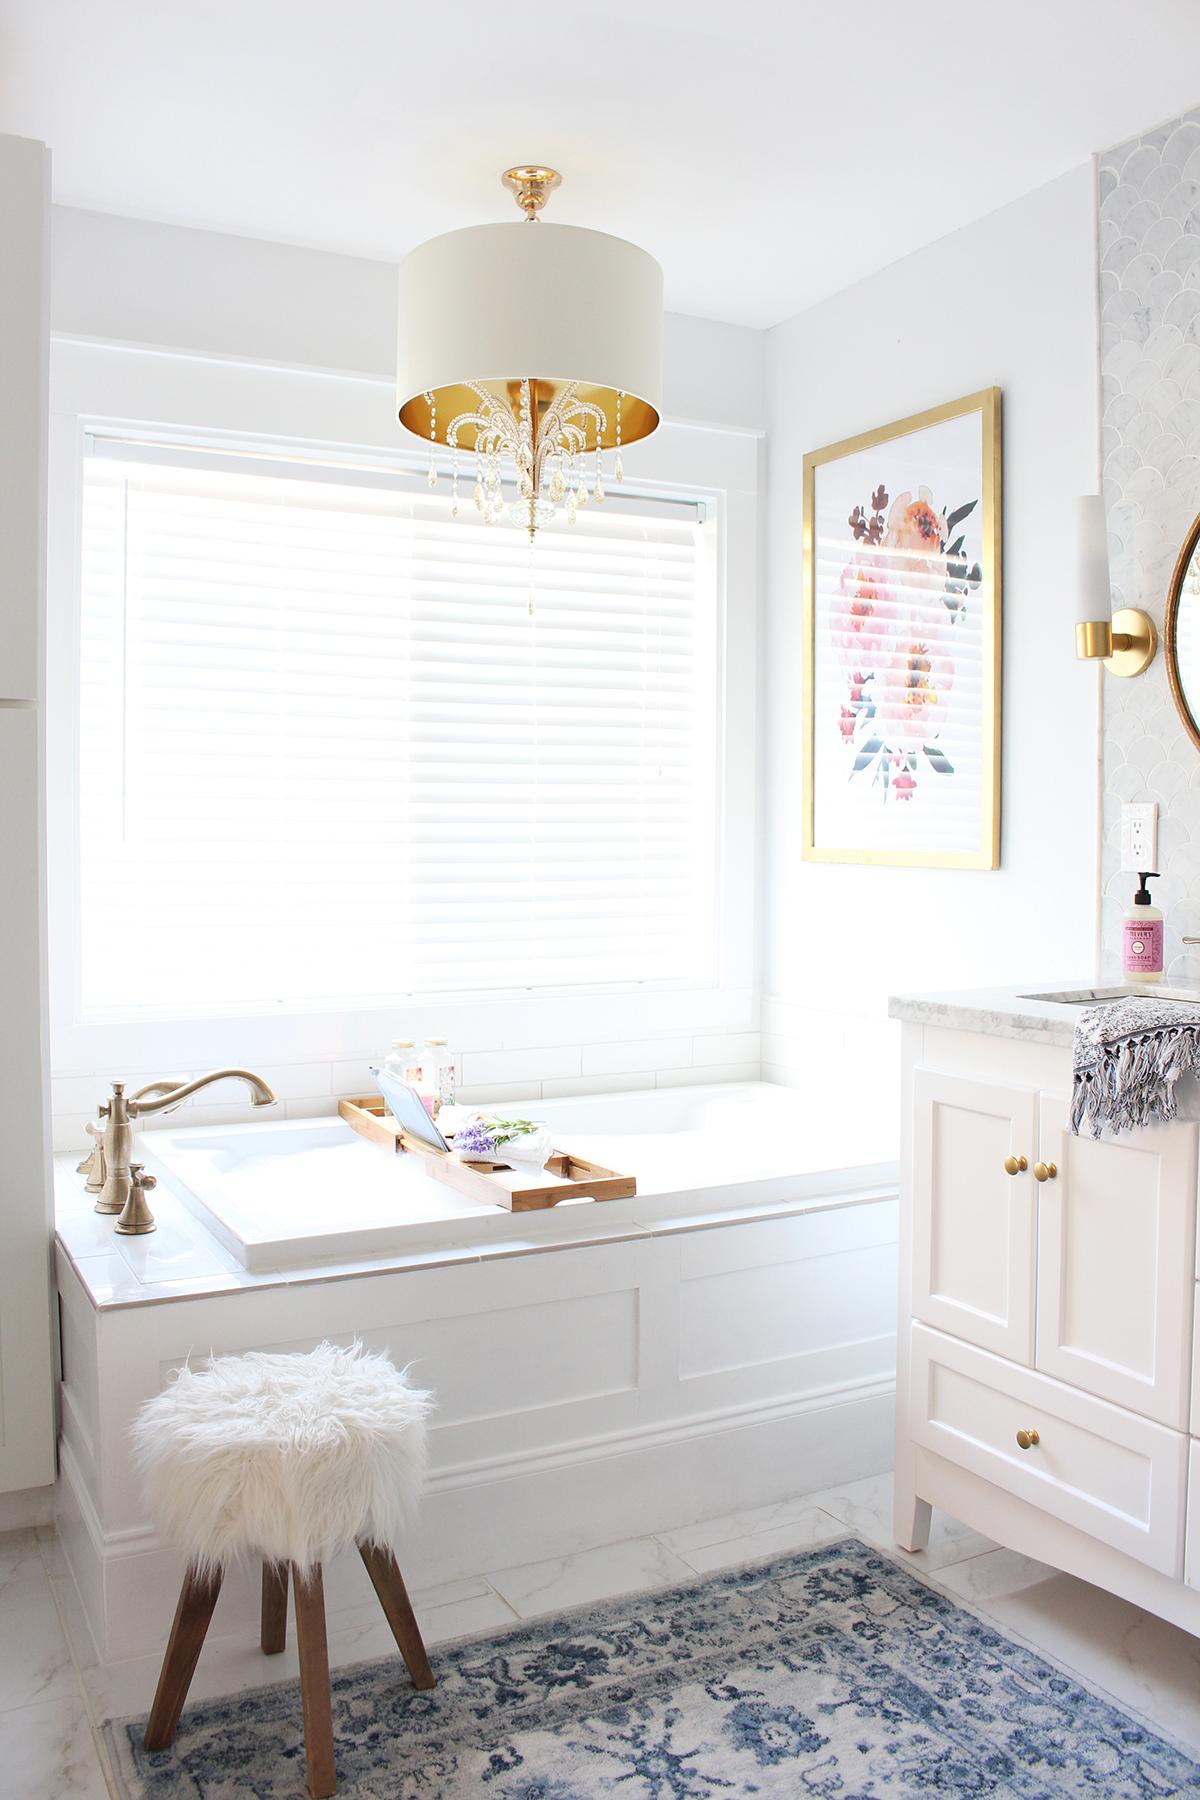 Prescott View Home Reno Master Bathroom Reveal Classy